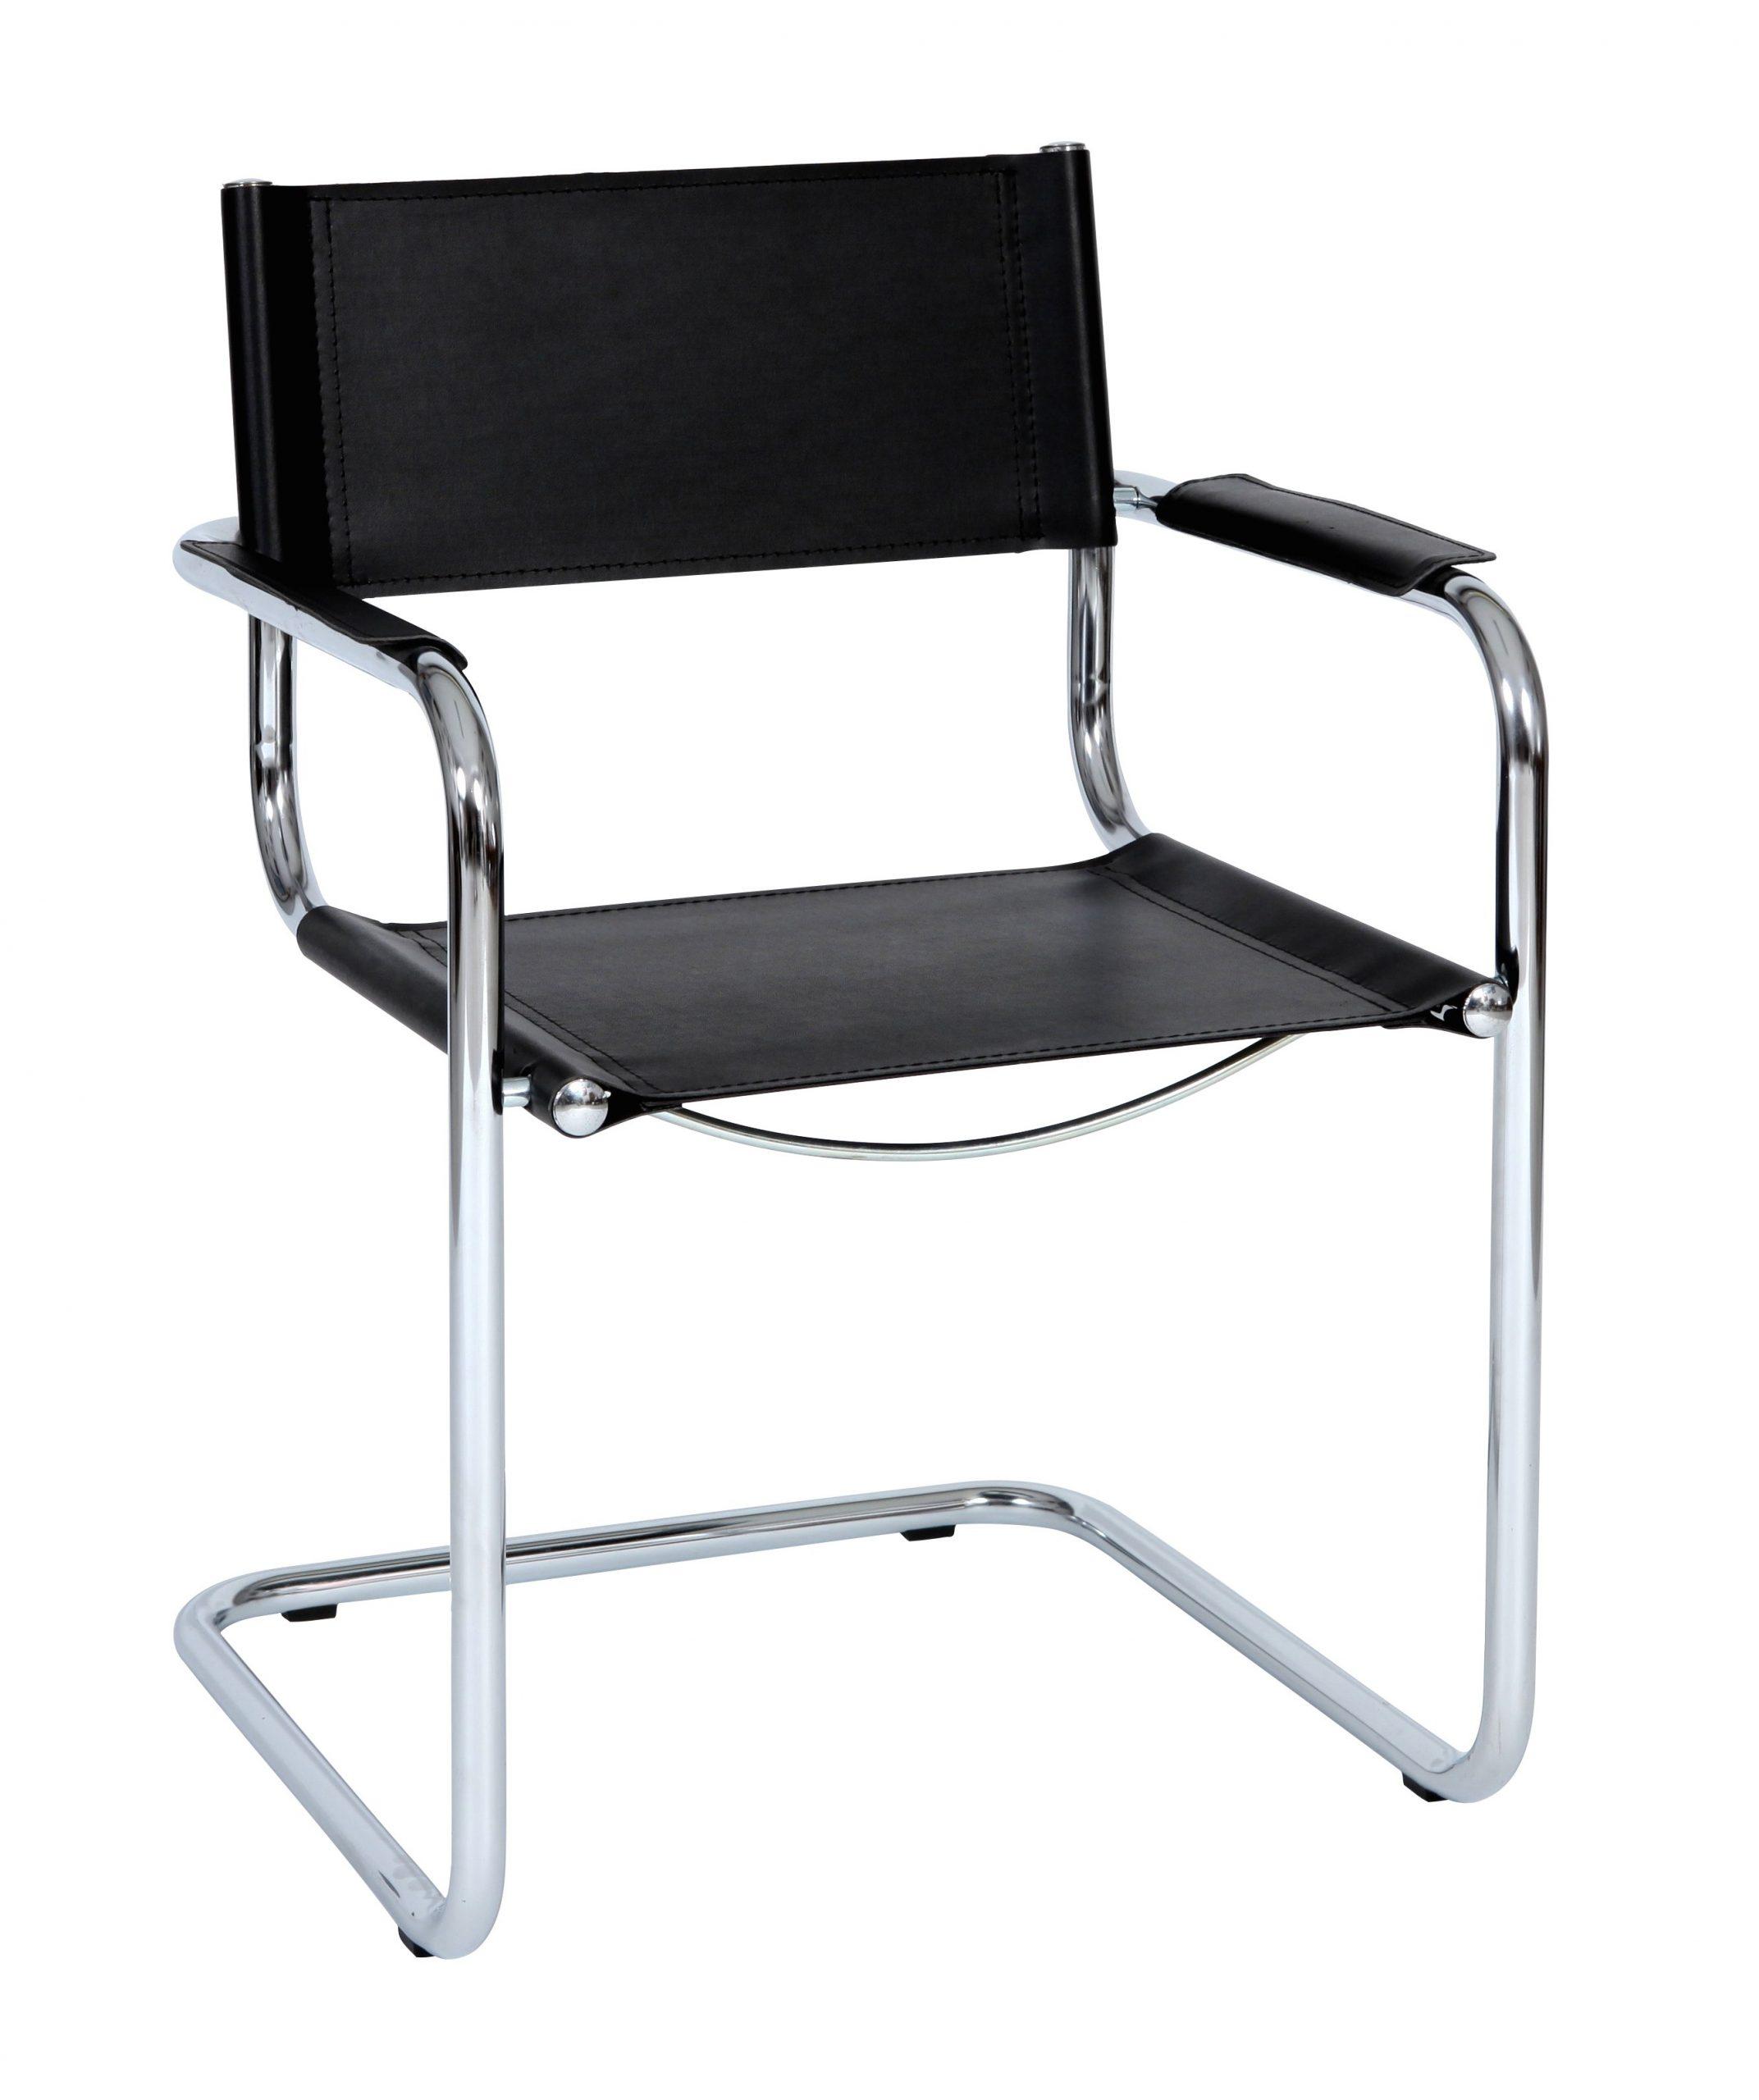 Mooie Stevige Bureaustoel.Charley Vergaderstoel Van Bureaustoelen Mkb Mooi En Strak Design